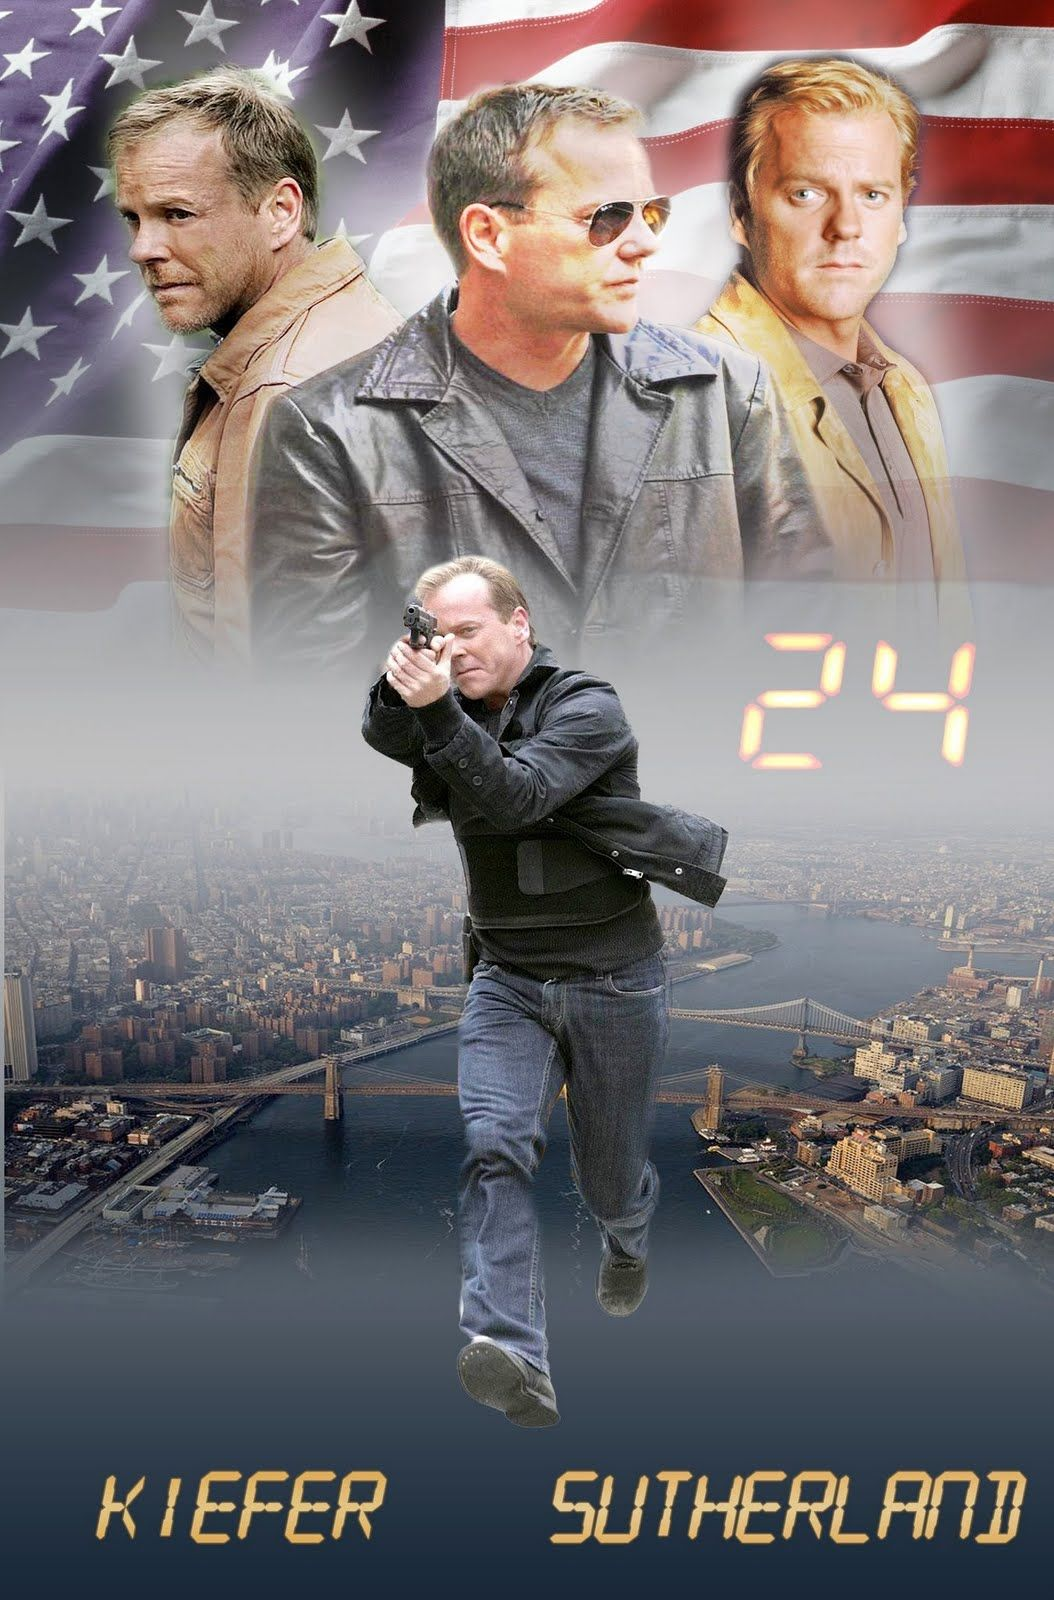 Kiefer Sutherland Documentales Cine Celebridades